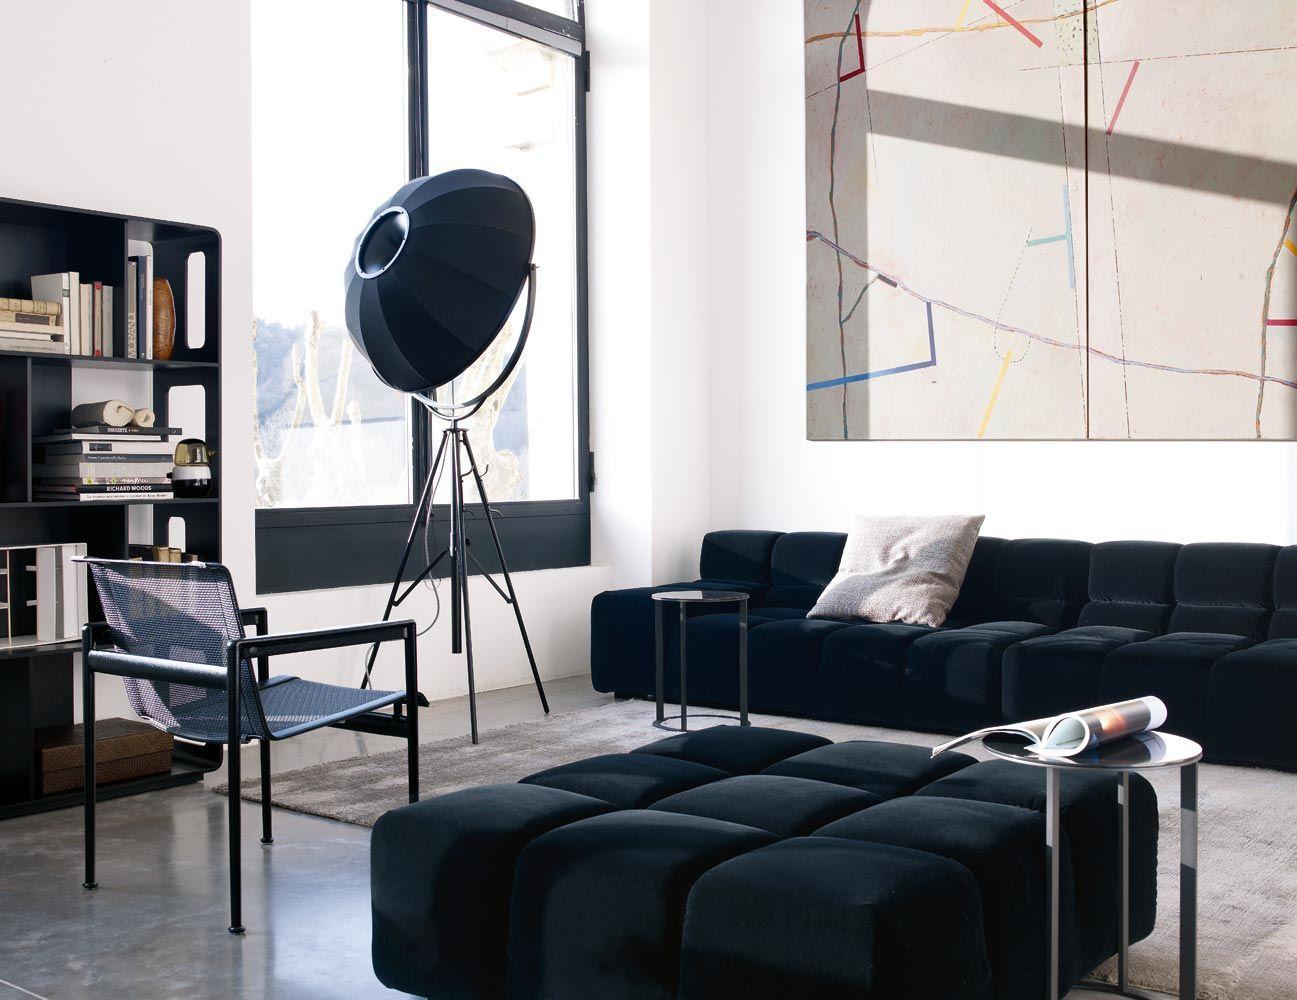 Sofas: TUFTY TIME   Kollektion: Bu0026B Italia   Design: Patricia Urquiola